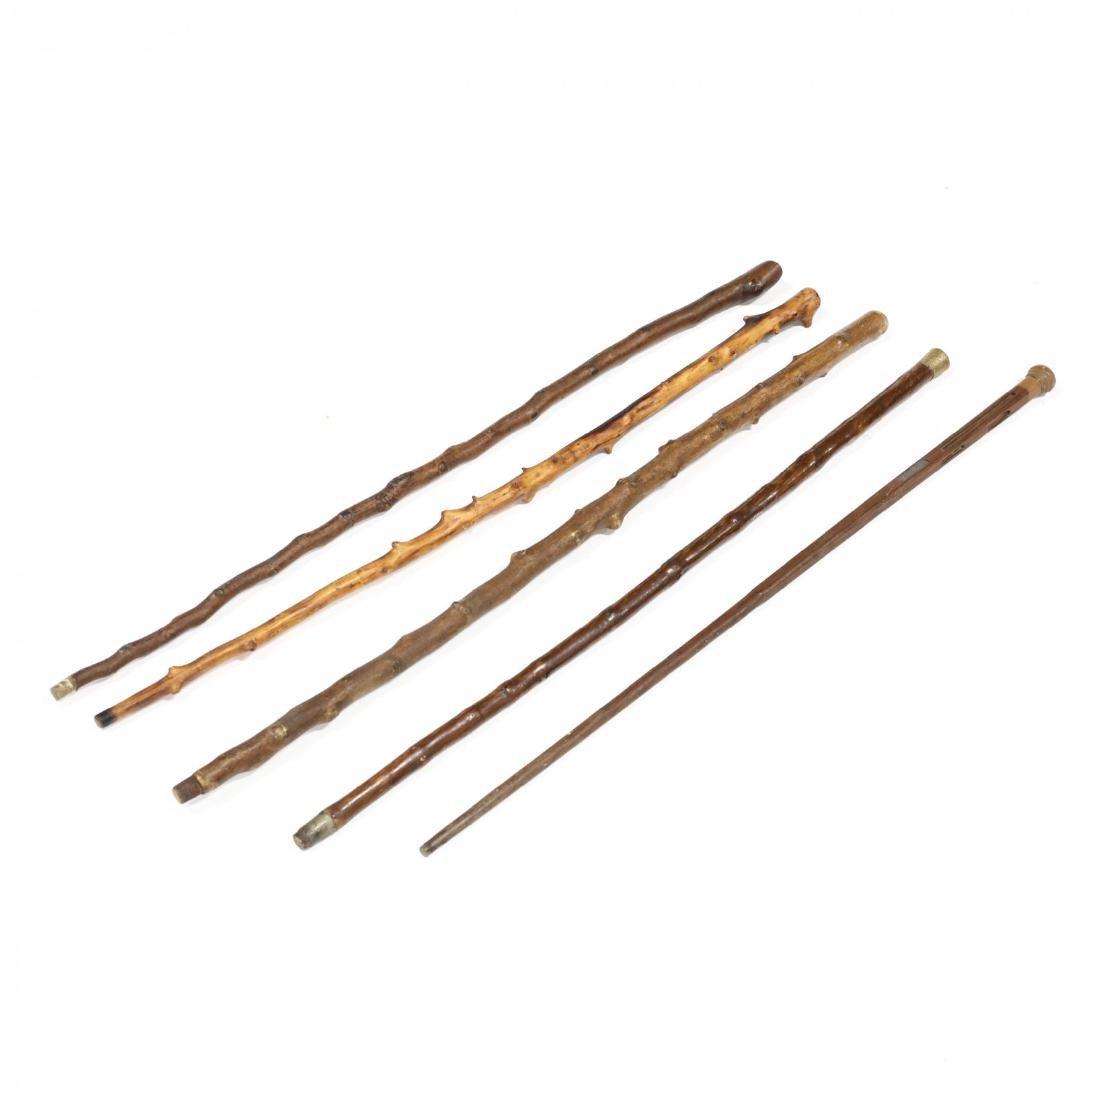 Five Vintage Walking Sticks